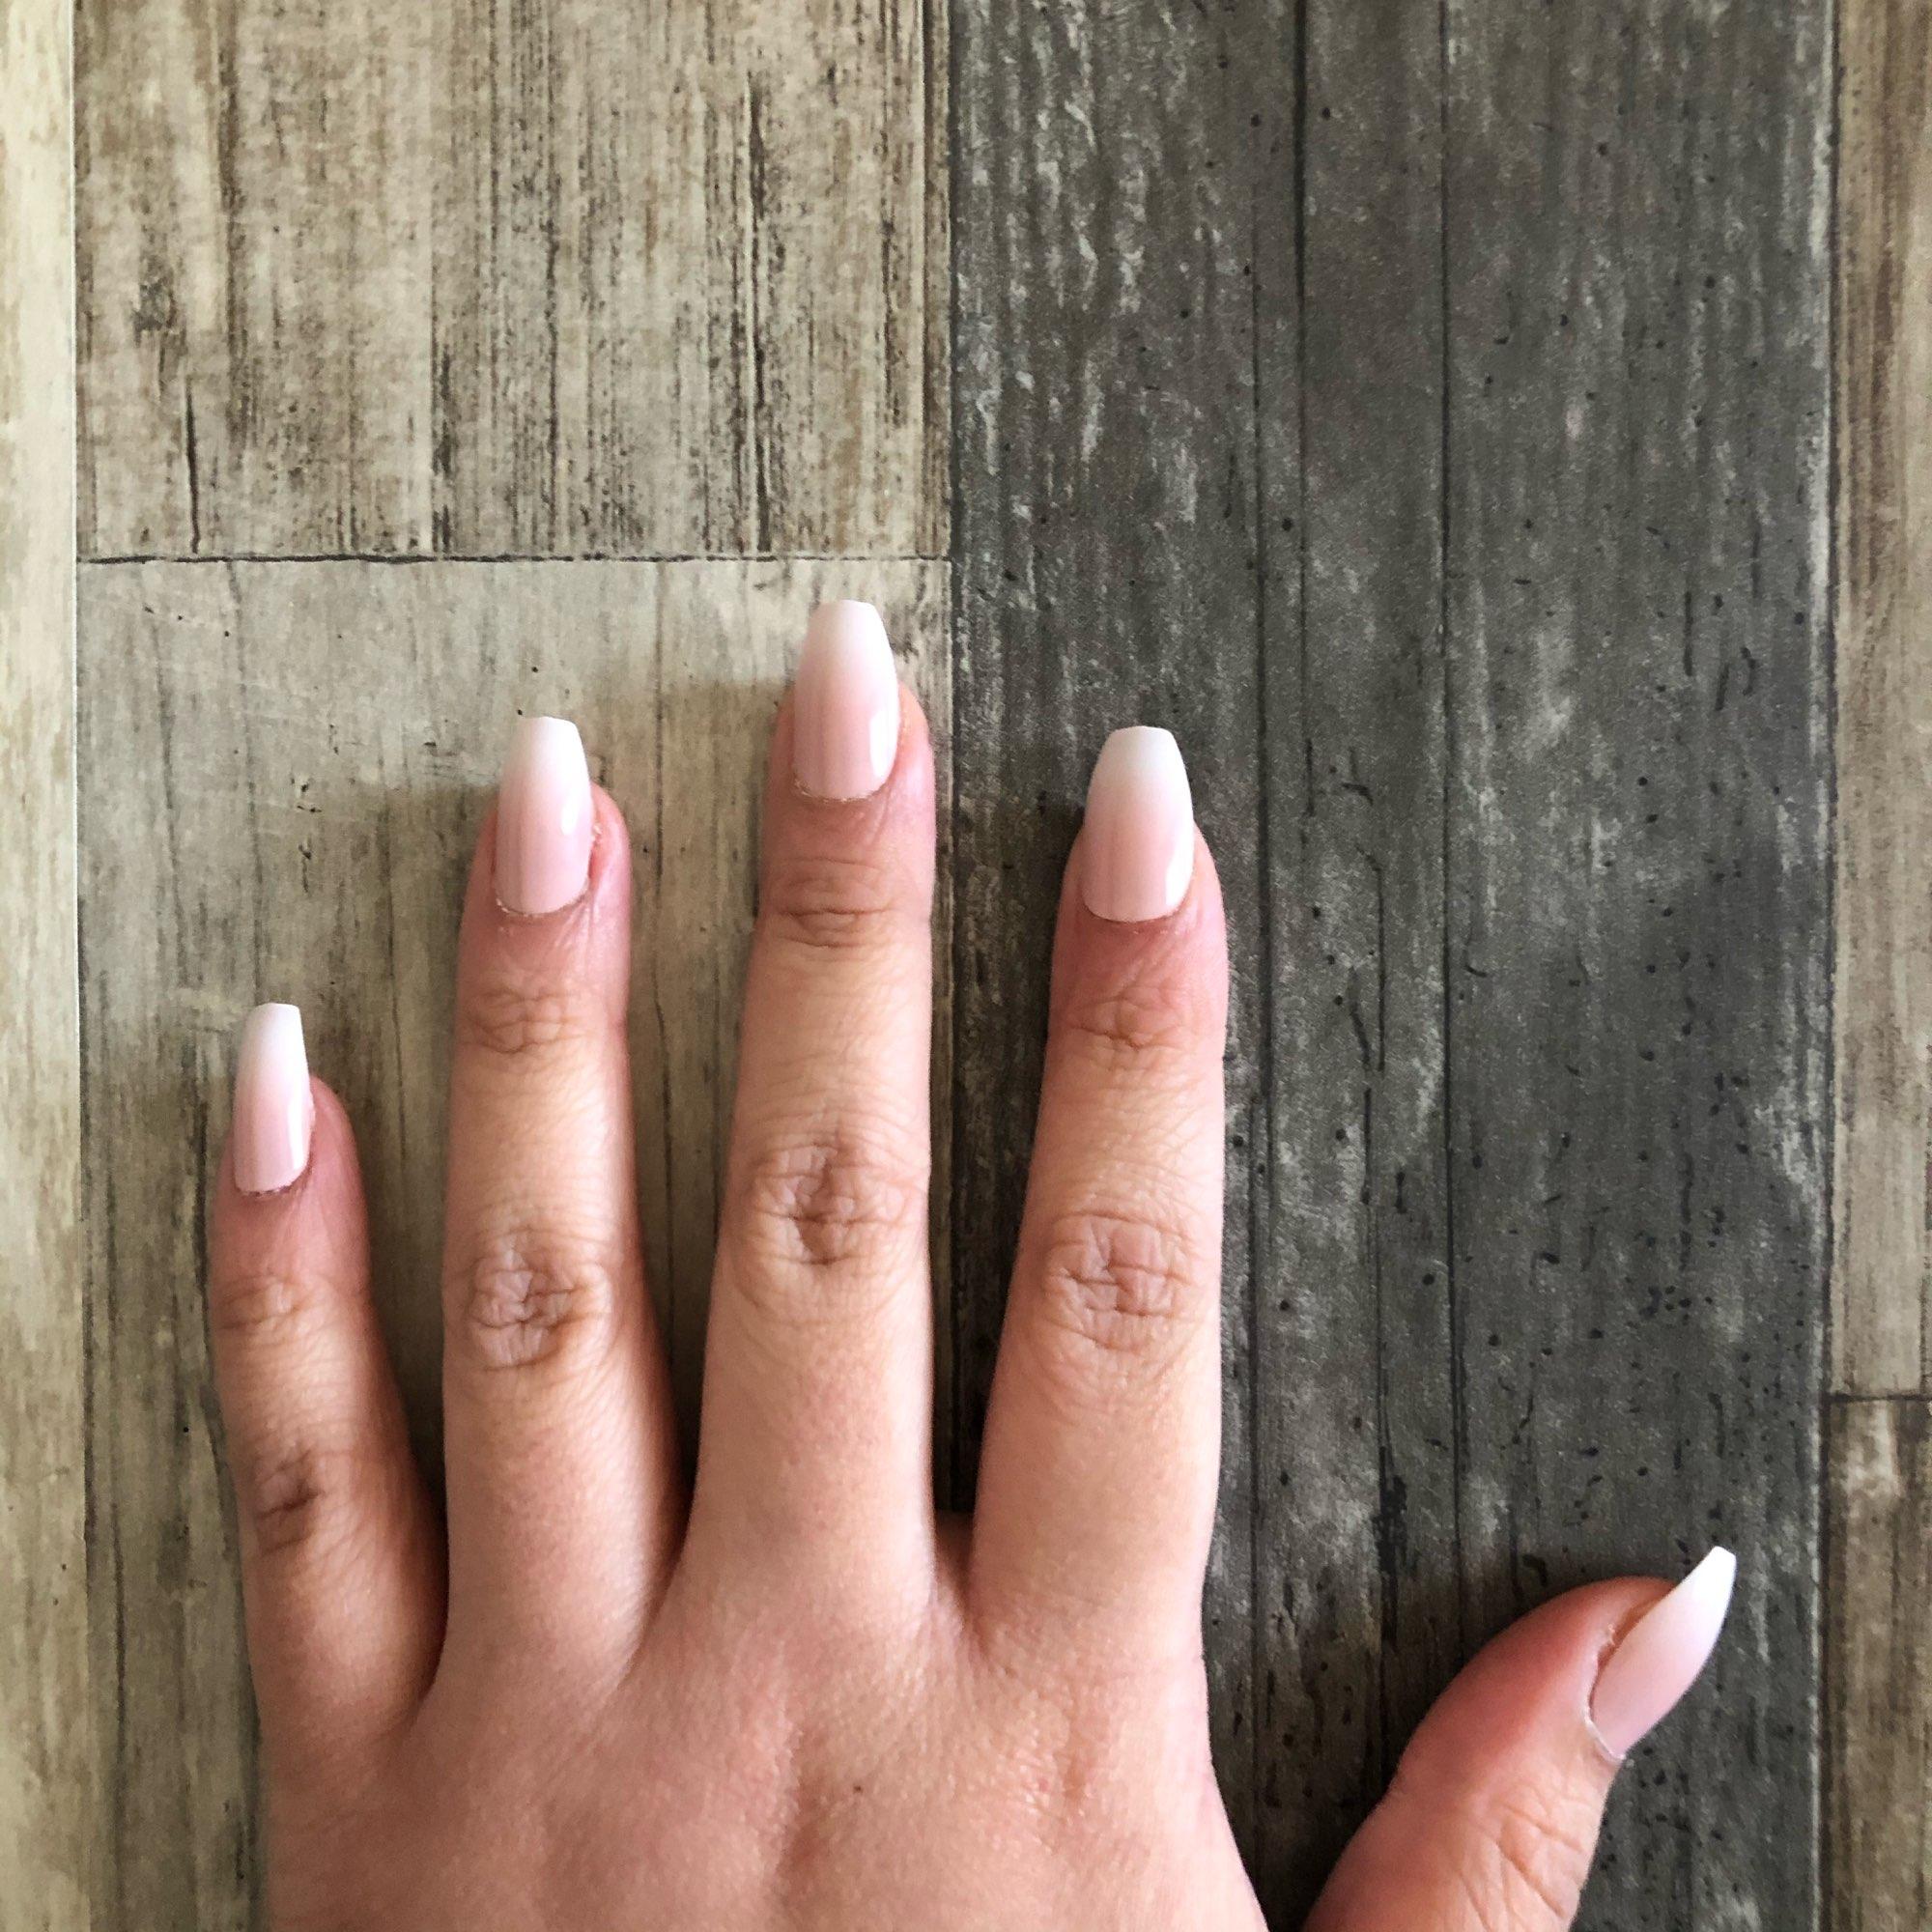 Ombre French Ballerina Fake Nail Gradeint Natural Coffin False Nails Wholesale Nails Supplier 24 photo review